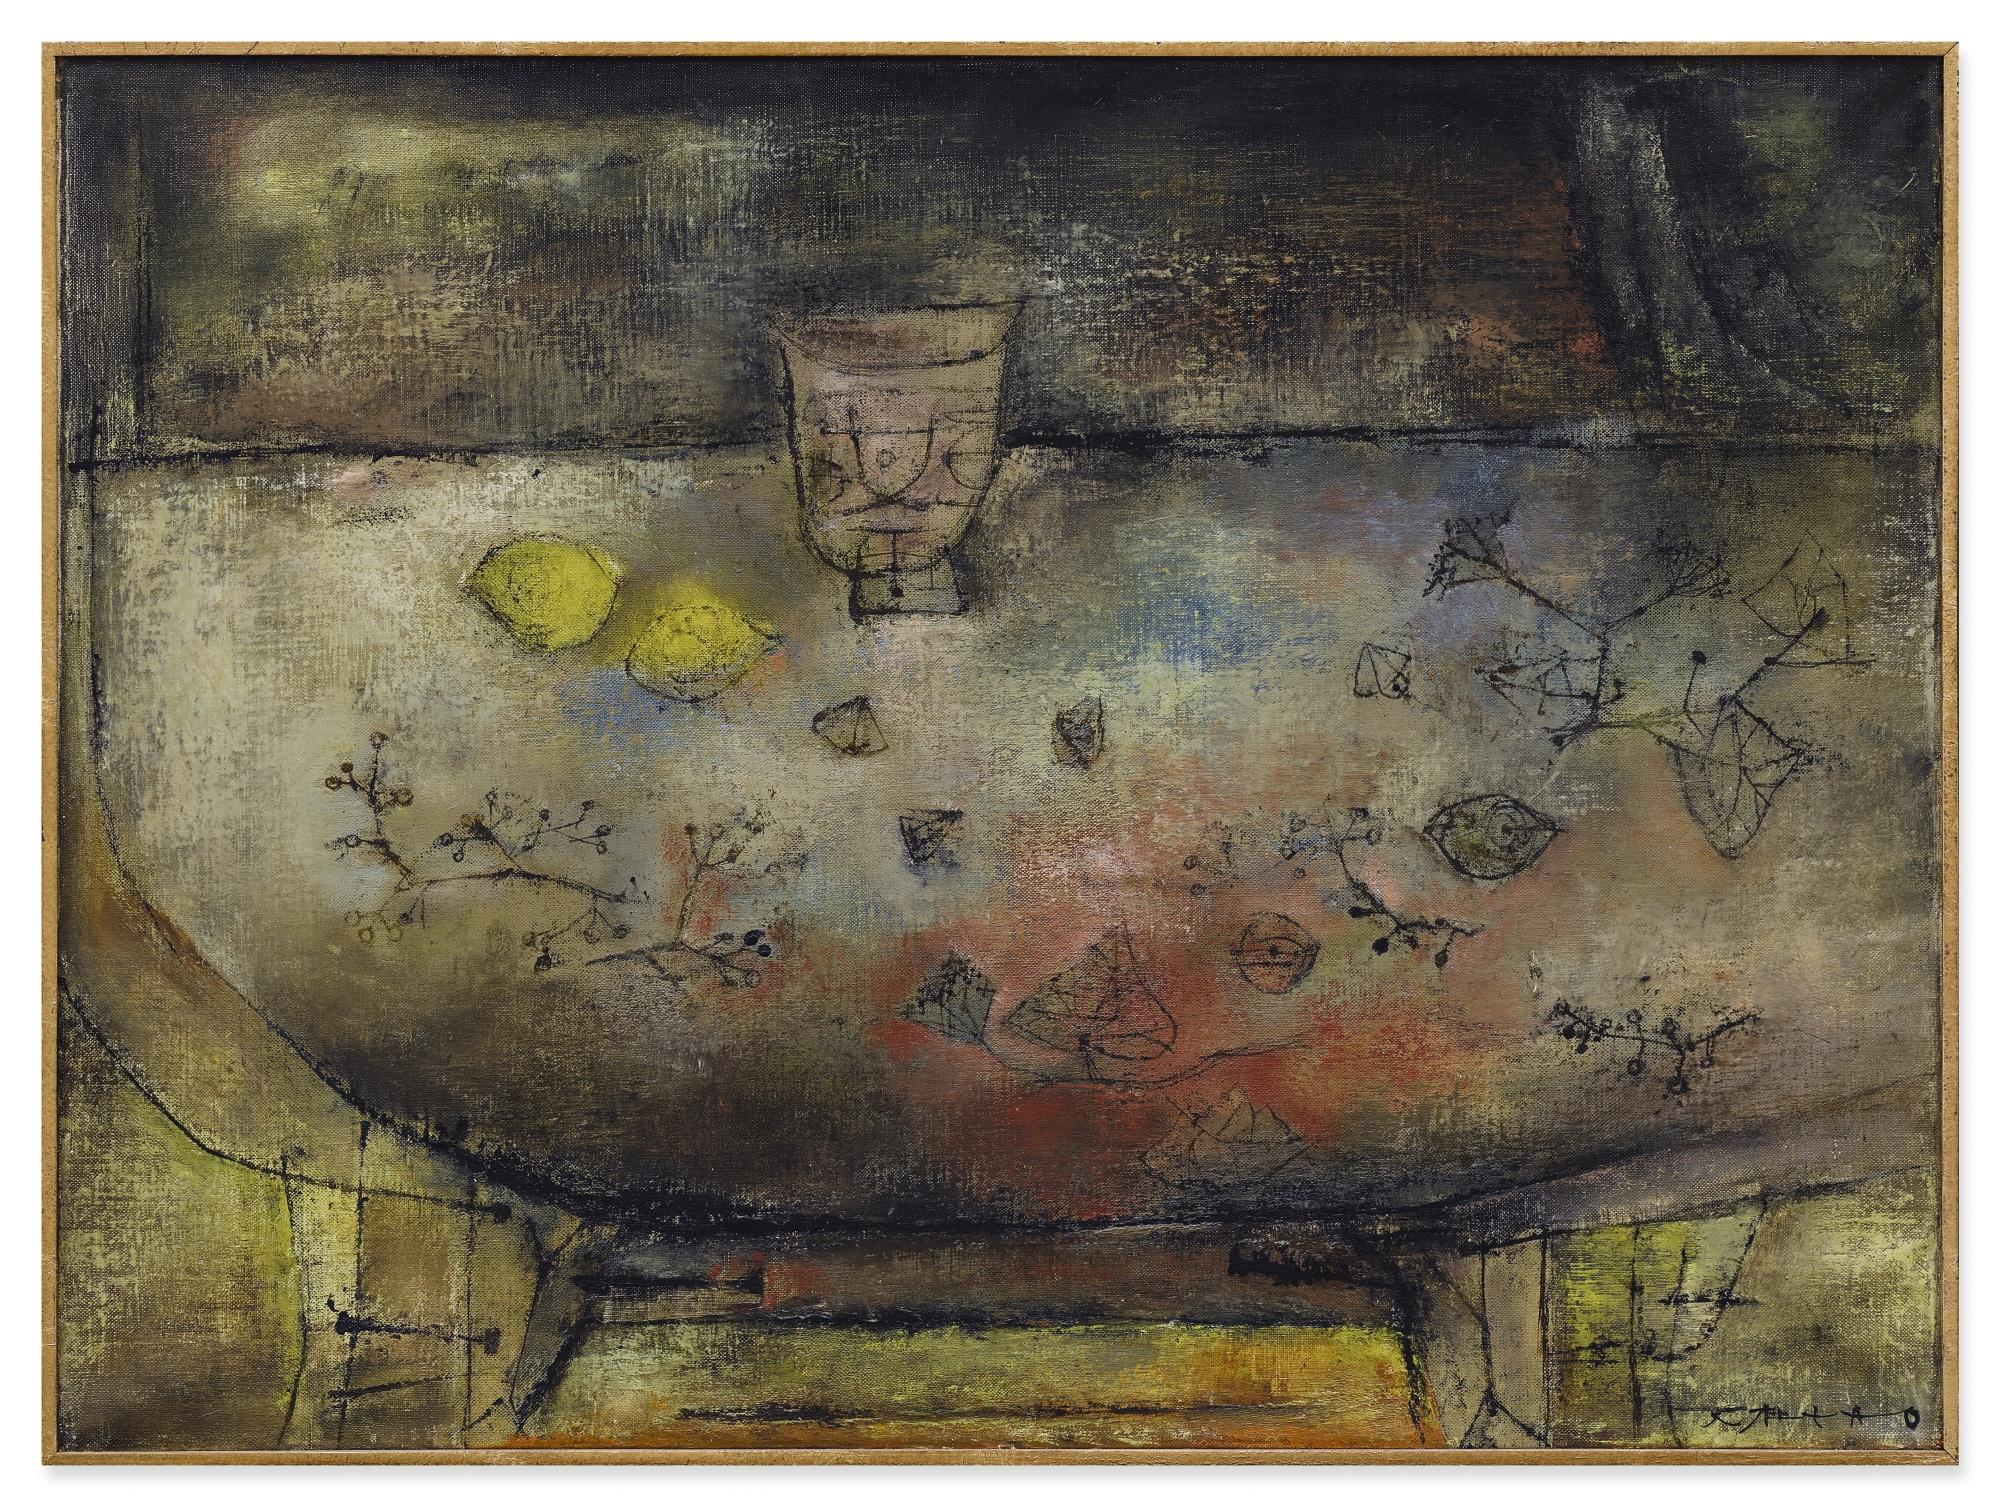 Zao Wou-Ki-Nature Morte Sur Une Table Ronde-1953